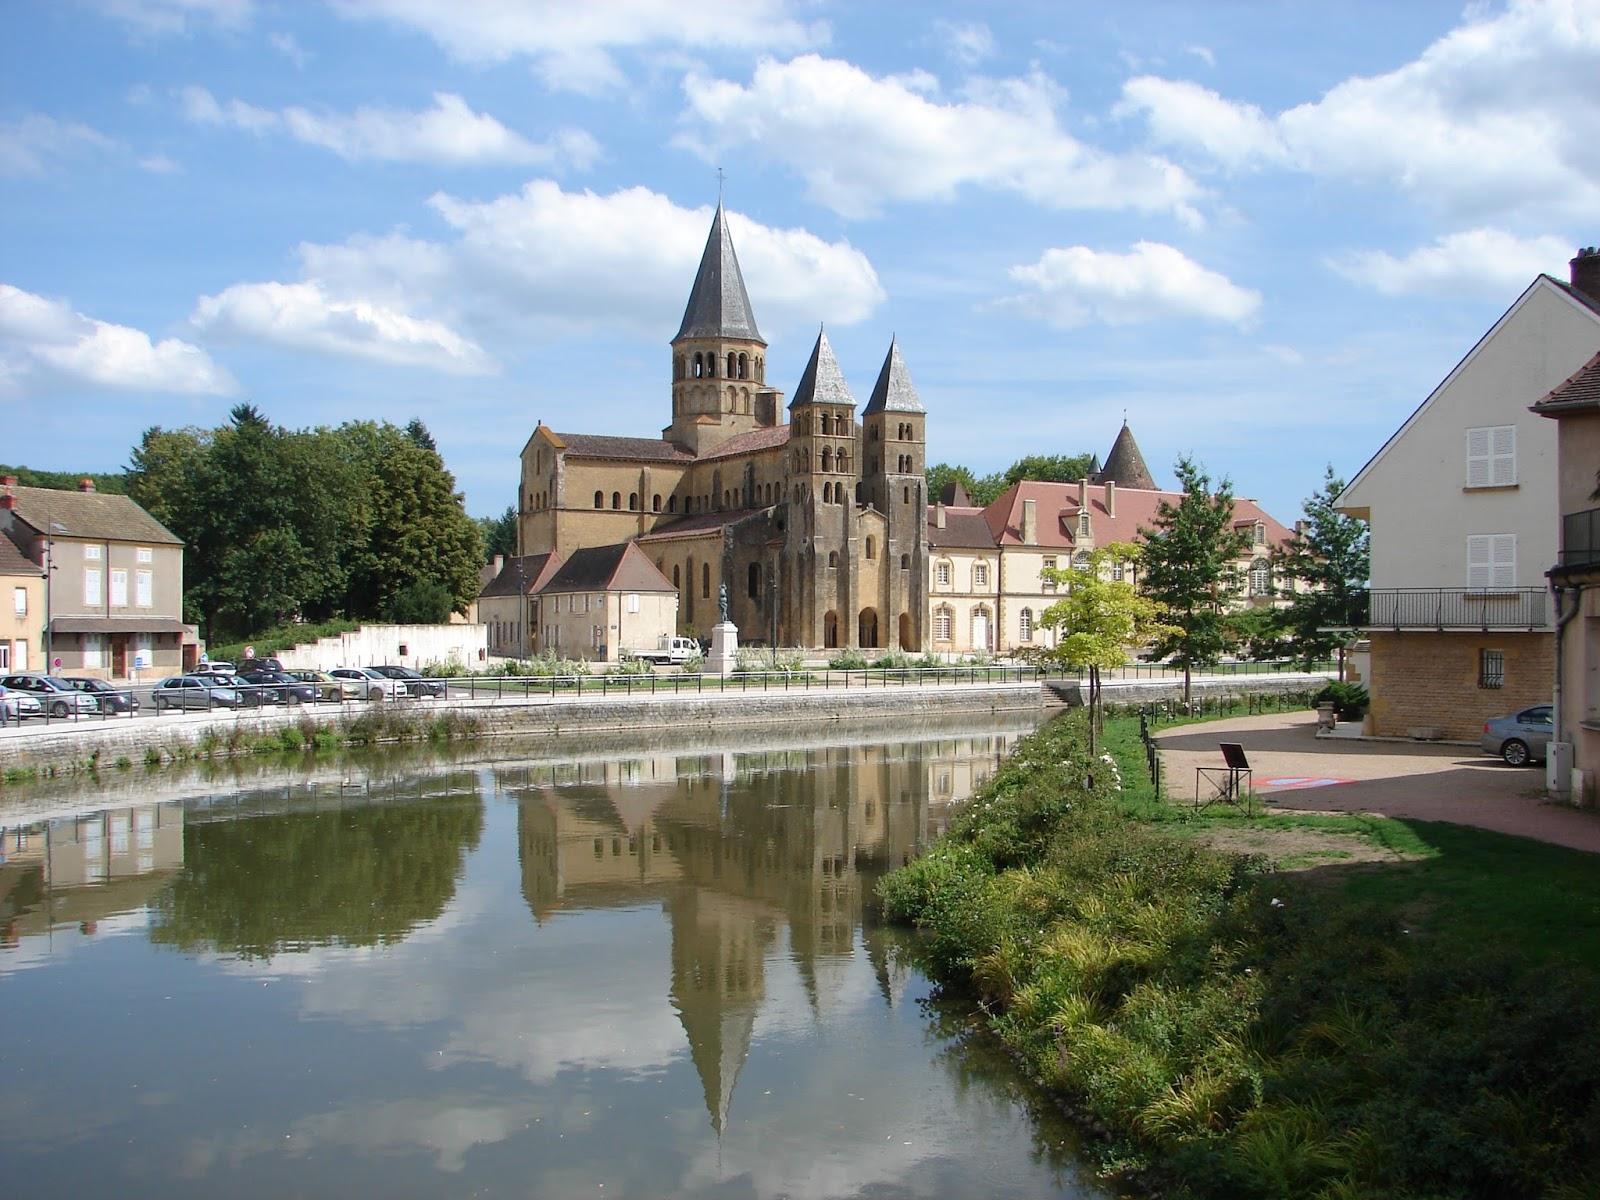 Igrexa de Paray-le-Monial (XMLS)